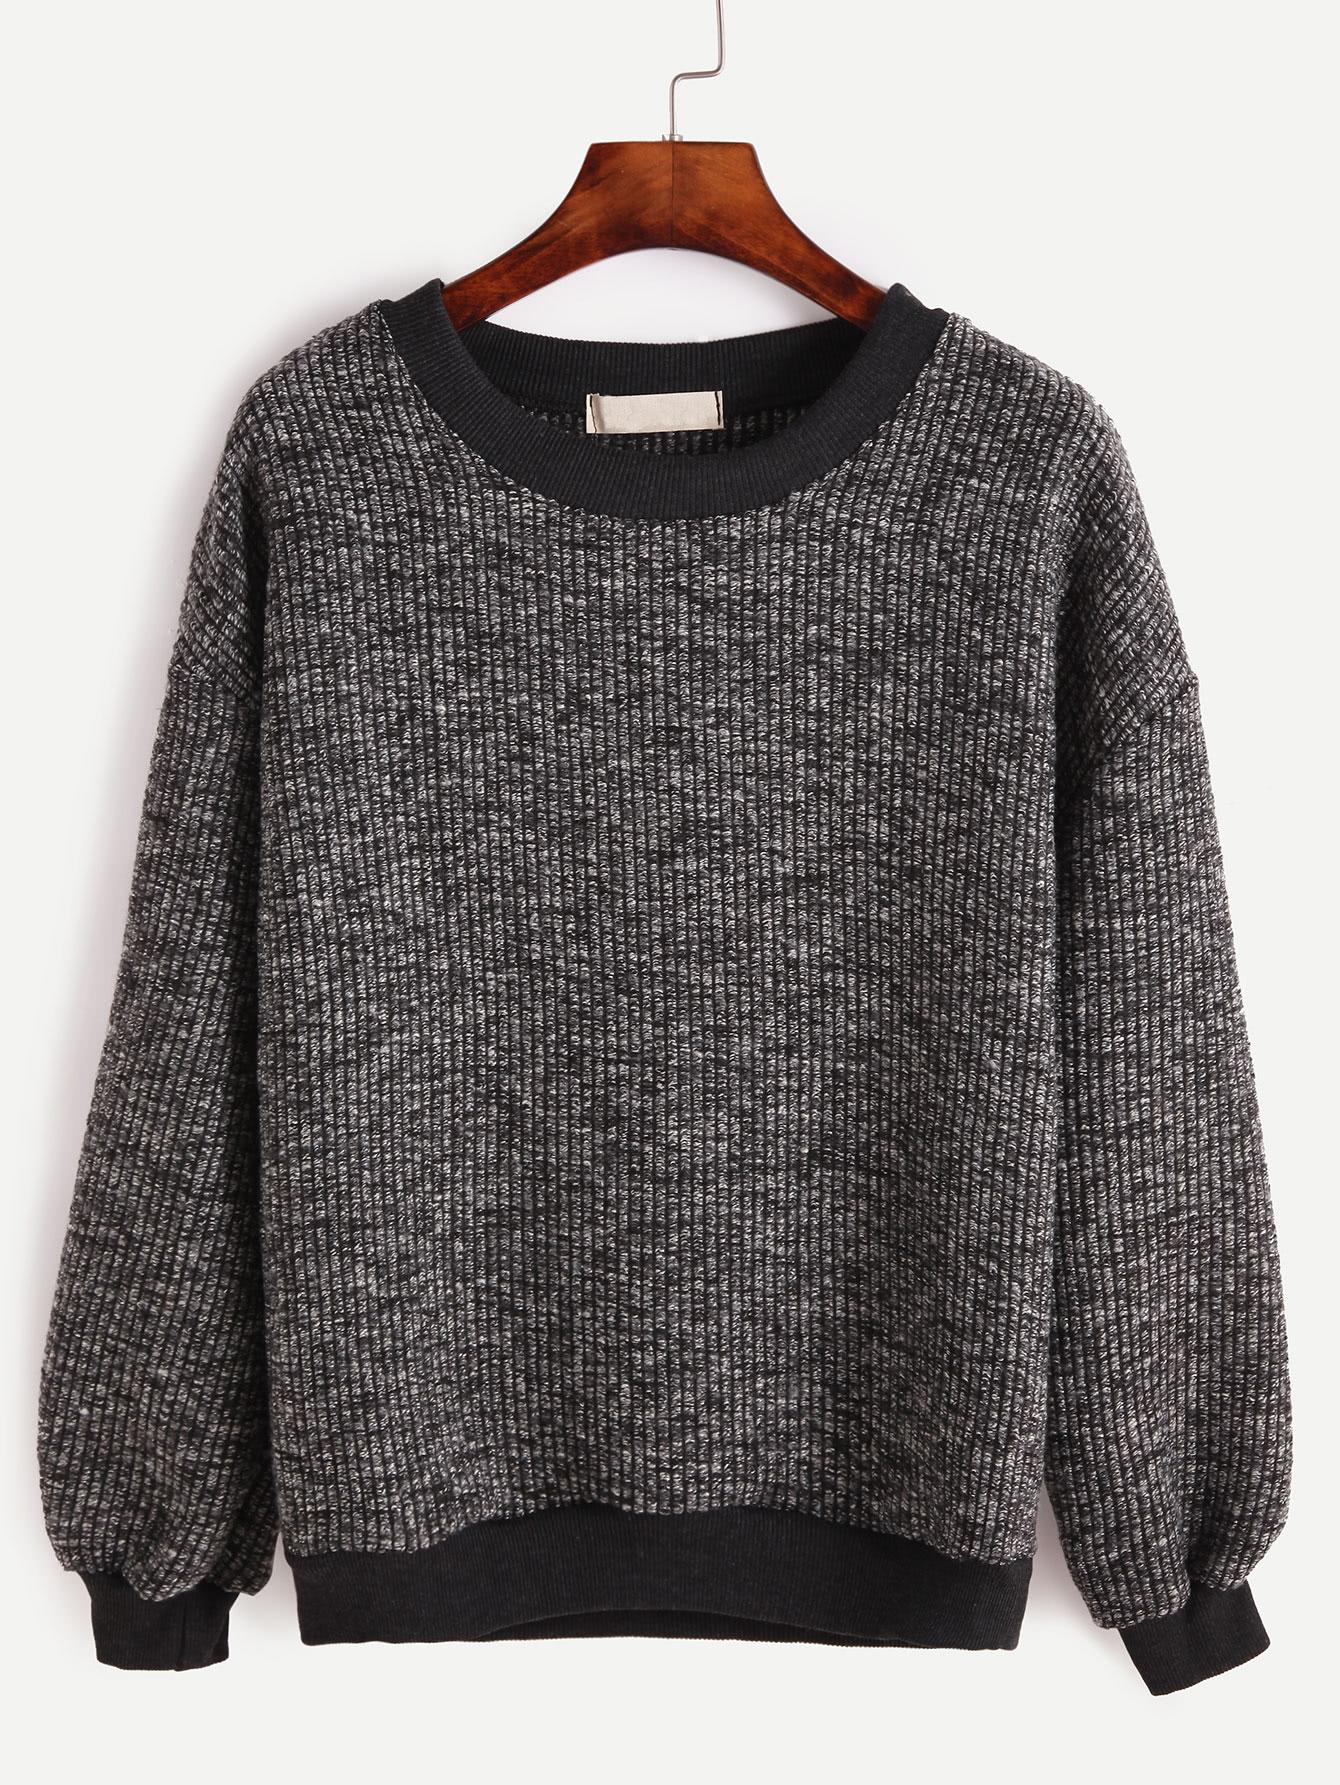 Contrast Trim Ribbed Sweatshirt sweatshirt160921102